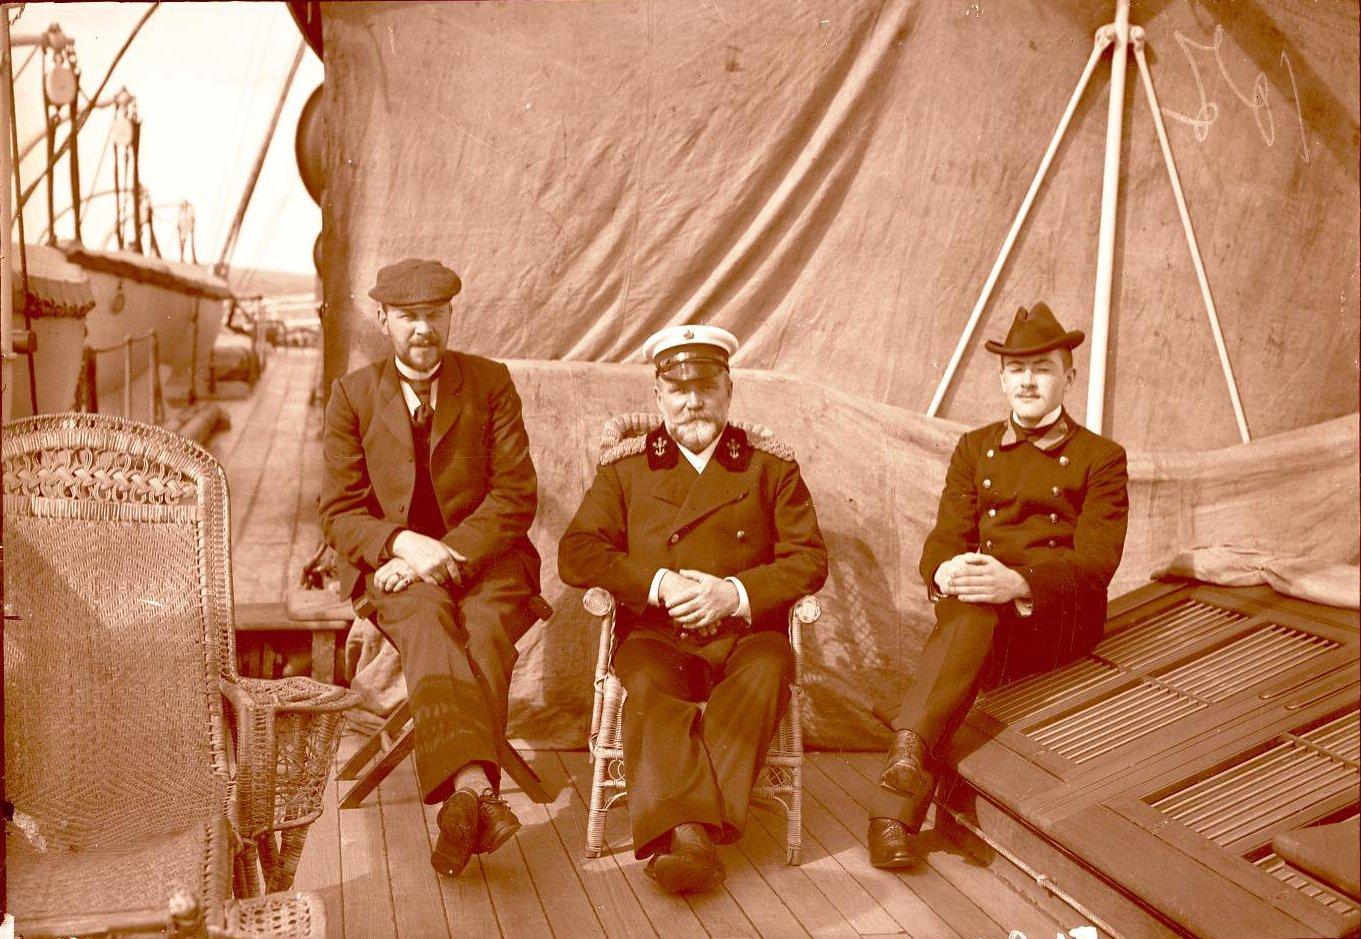 12. Греция, г. Пирей. Фонвизин, капитан Клаасен и Давыдов.